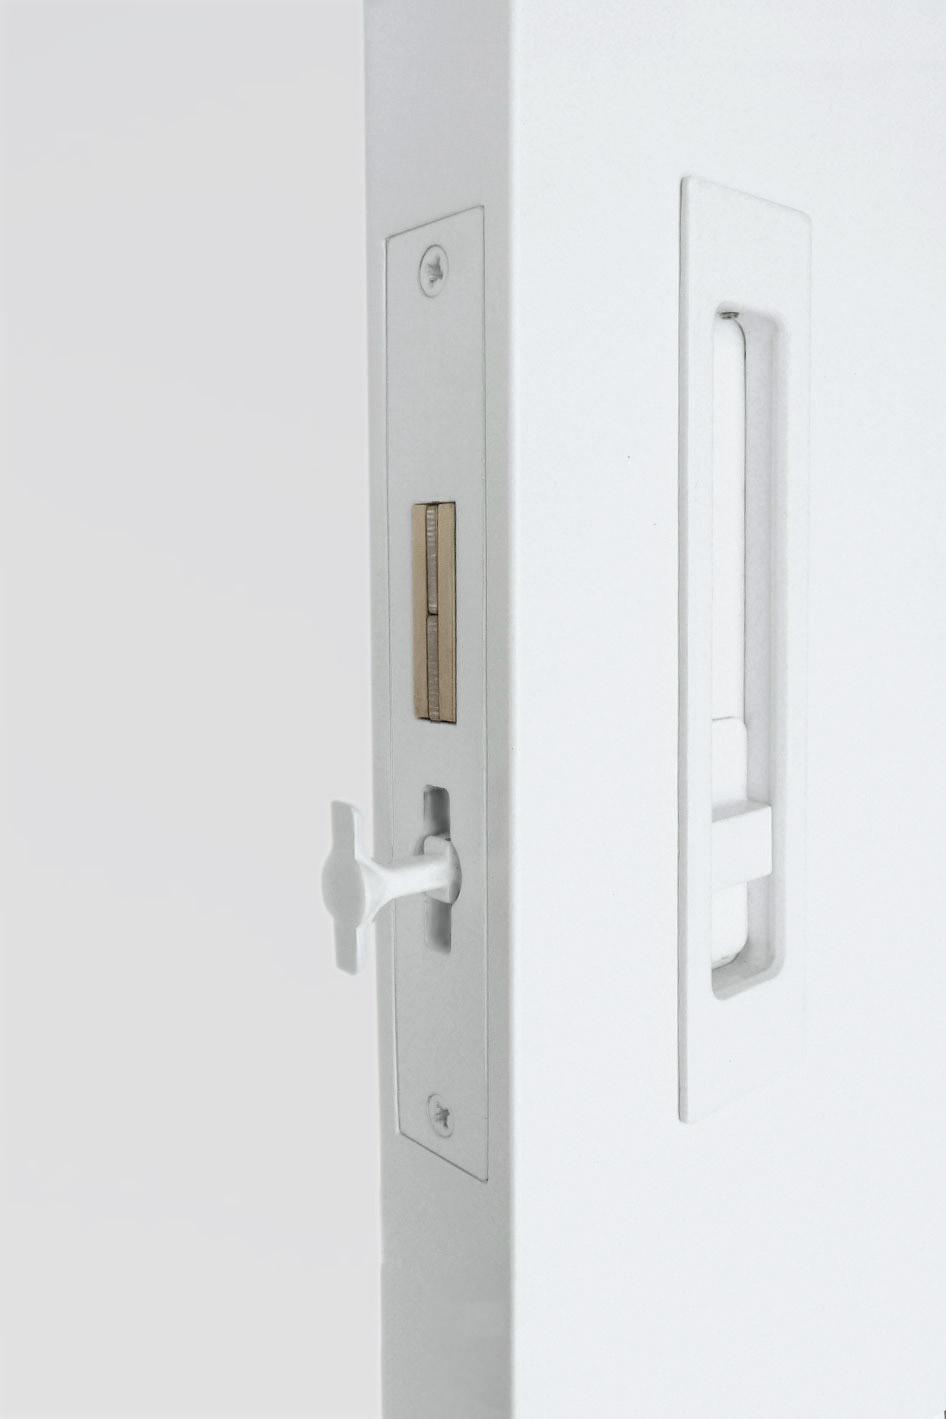 HB 690 : Sliding Pocket Door Privacy Lock Set